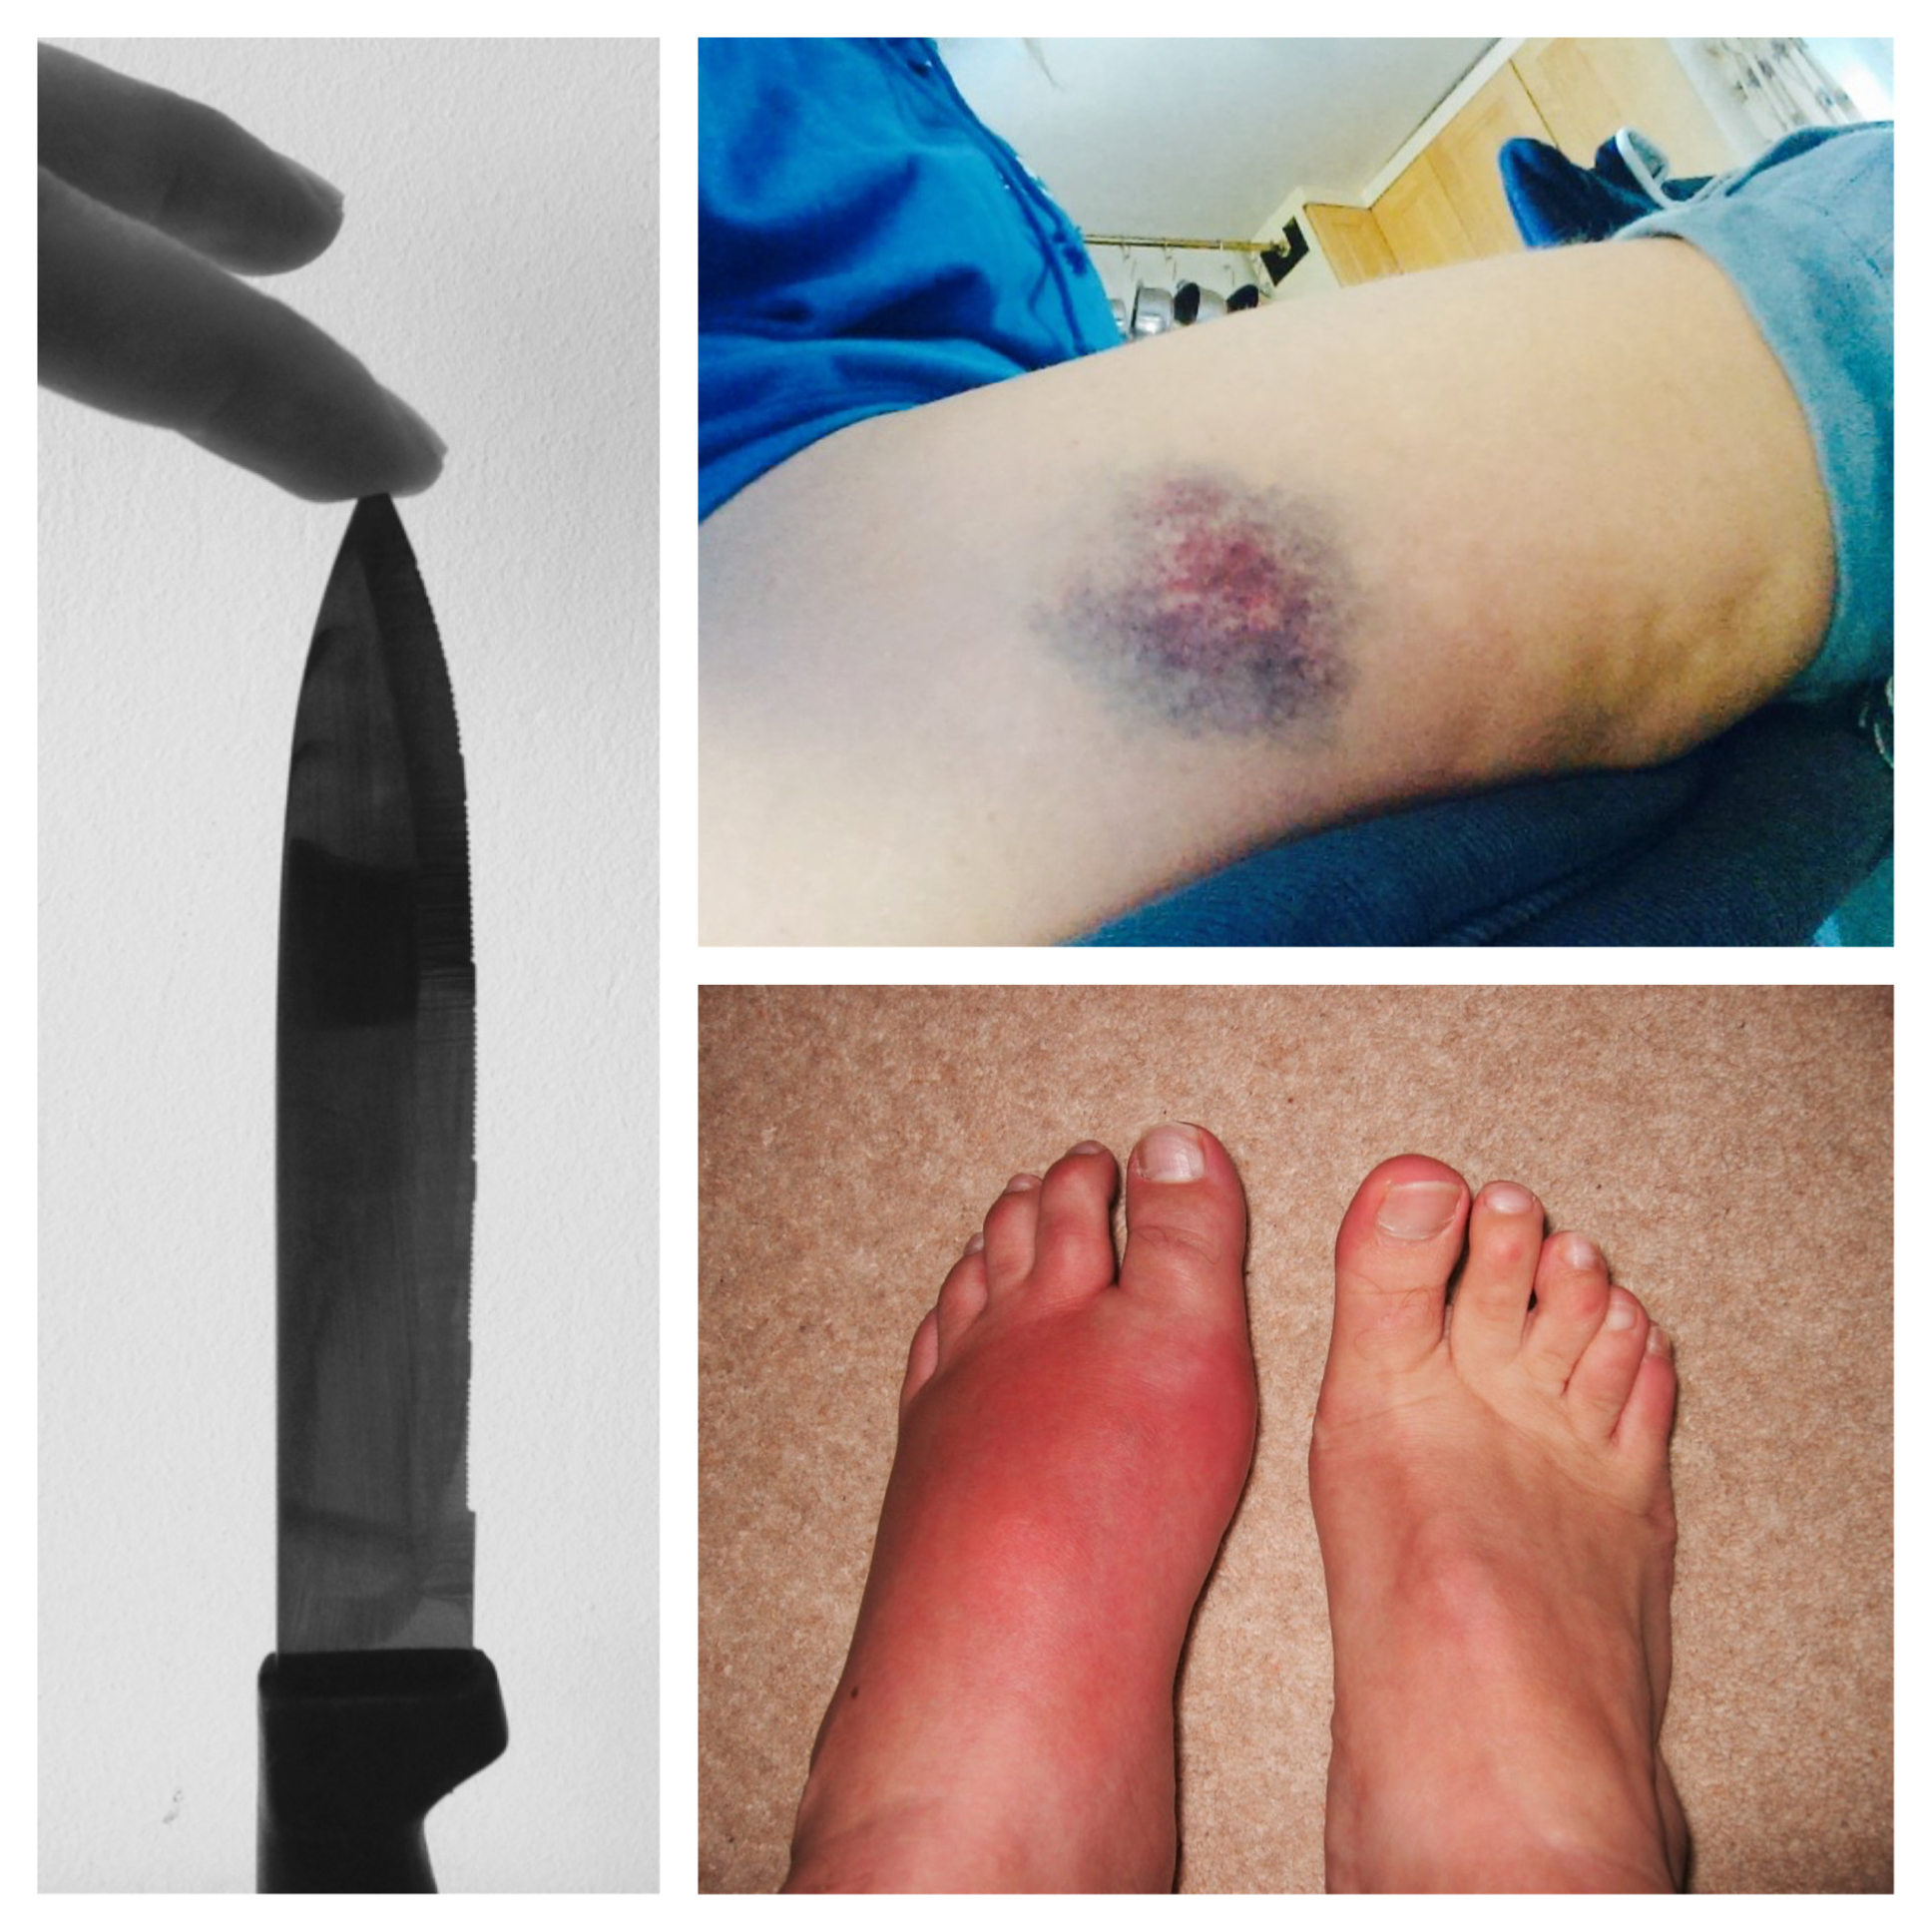 Dr Morton's - types of pain